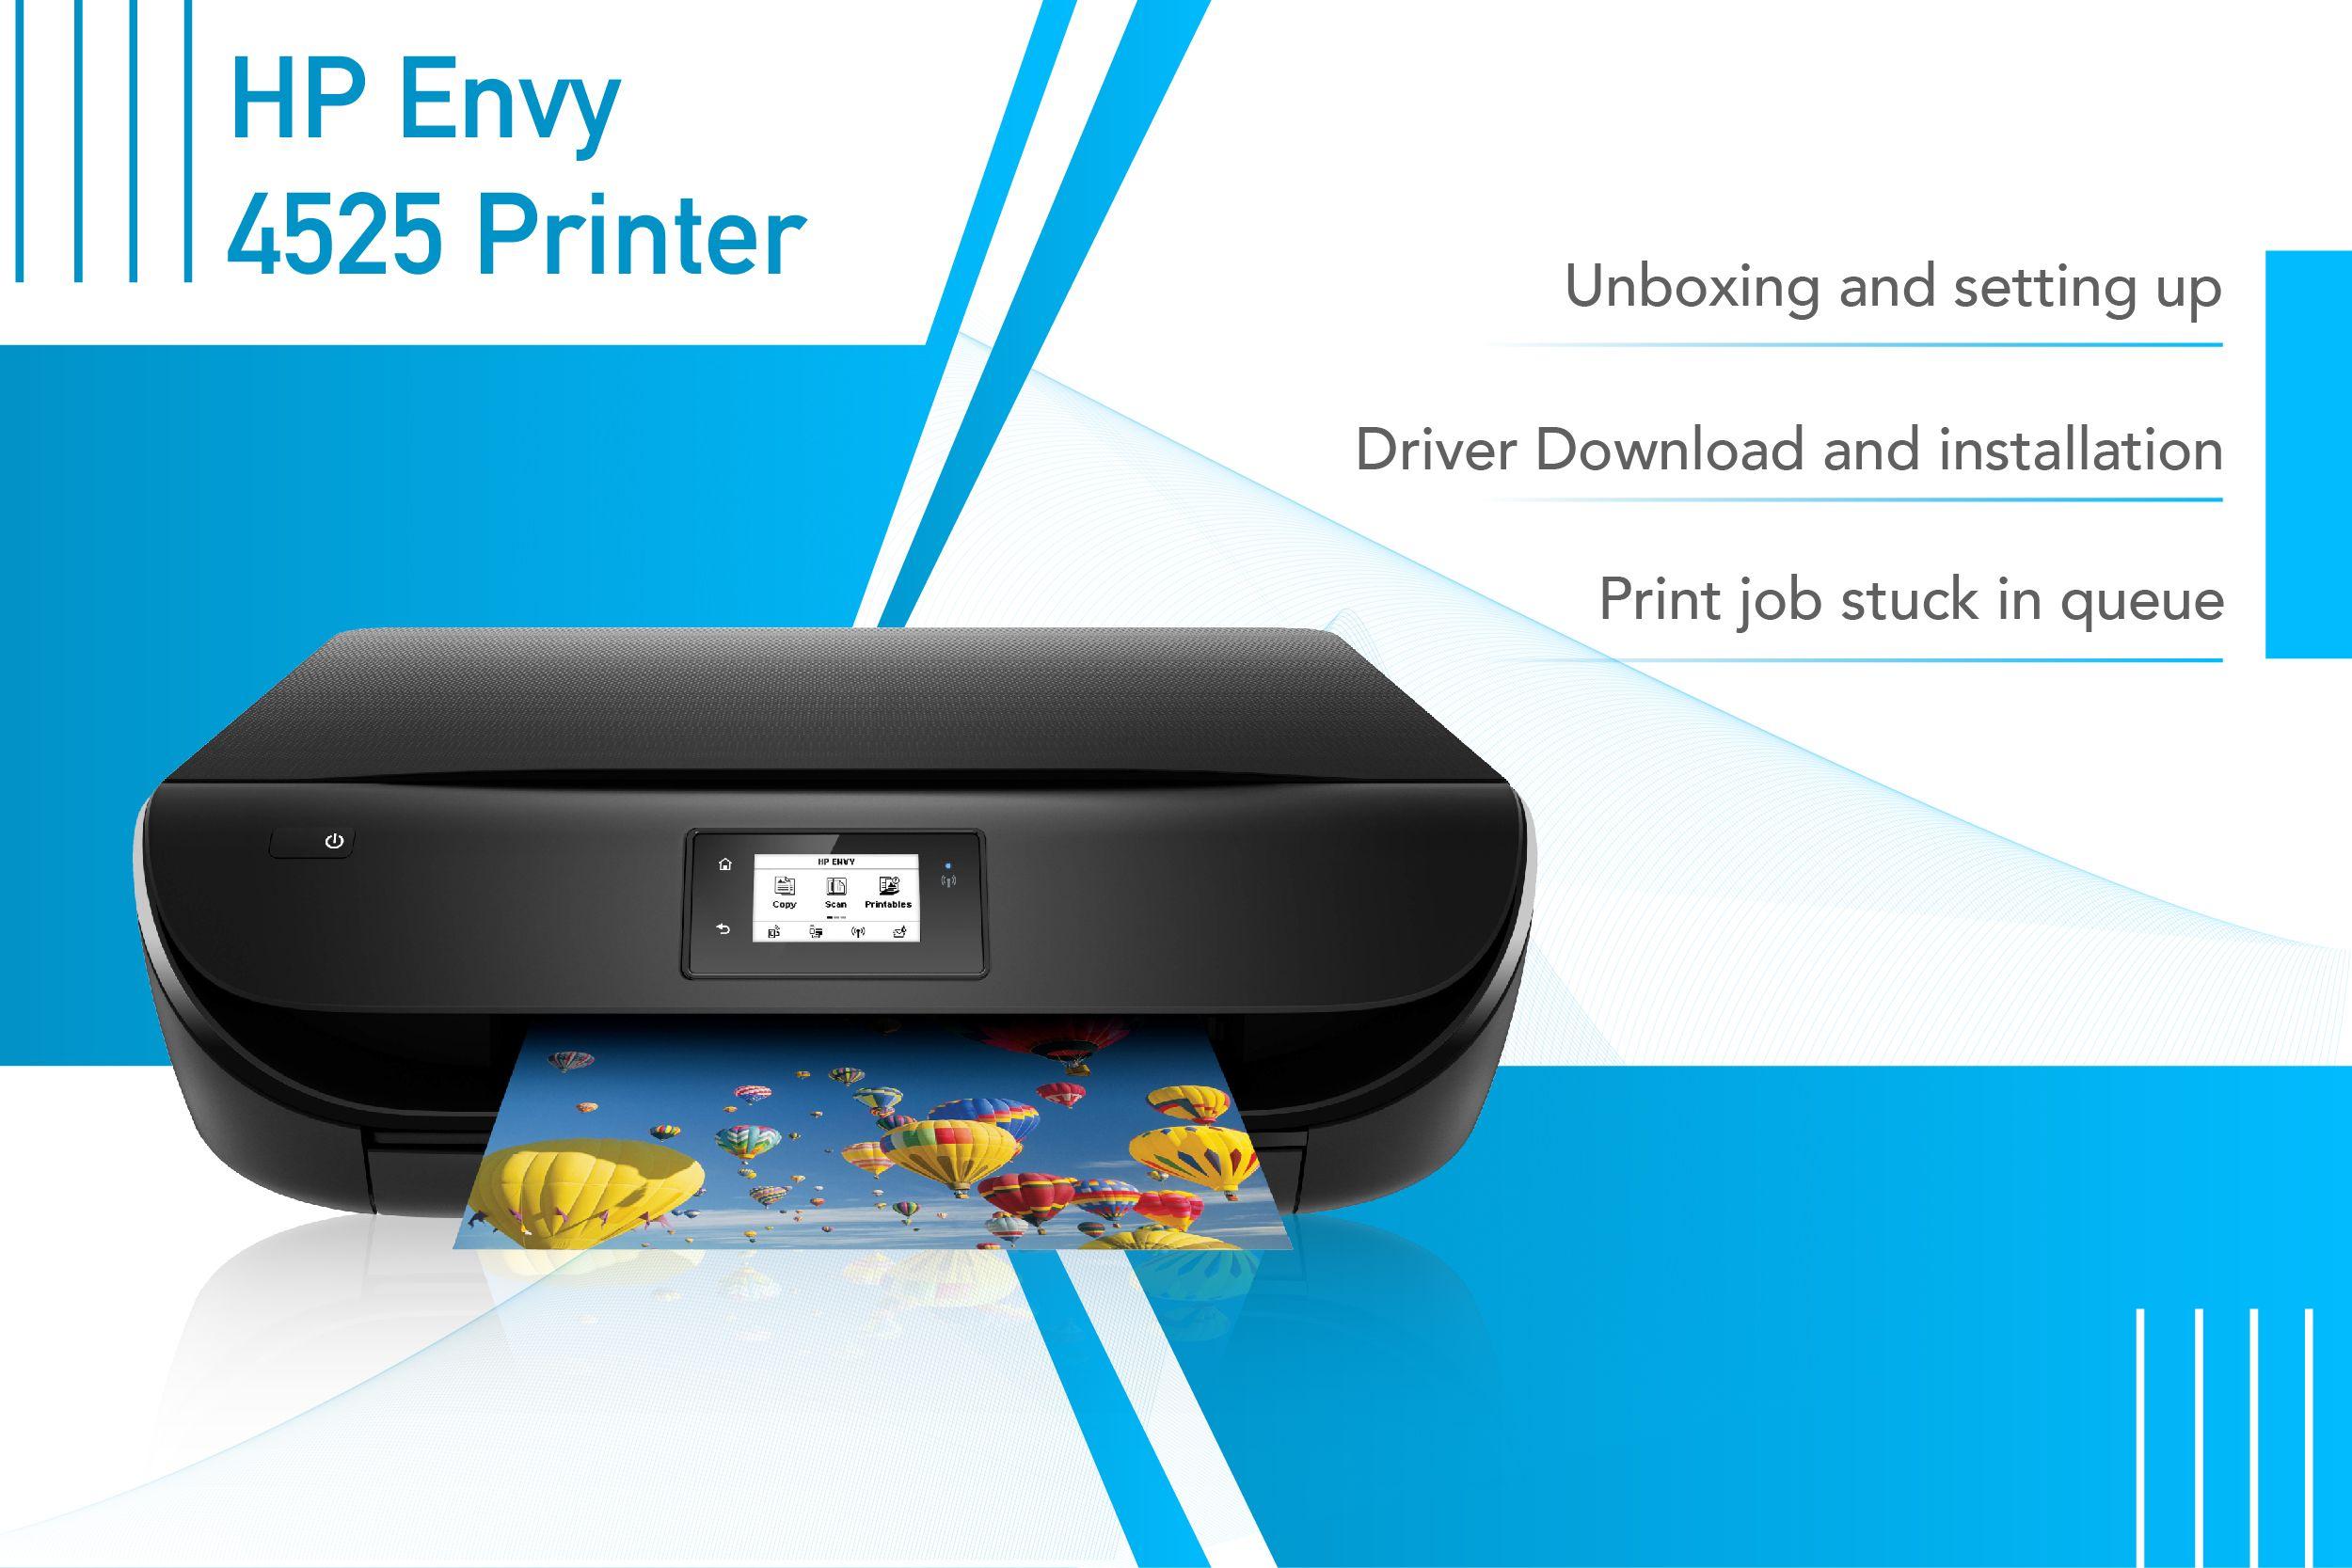 123 hp com/envy4520 in 2019 | HP Envy Printer | Printer